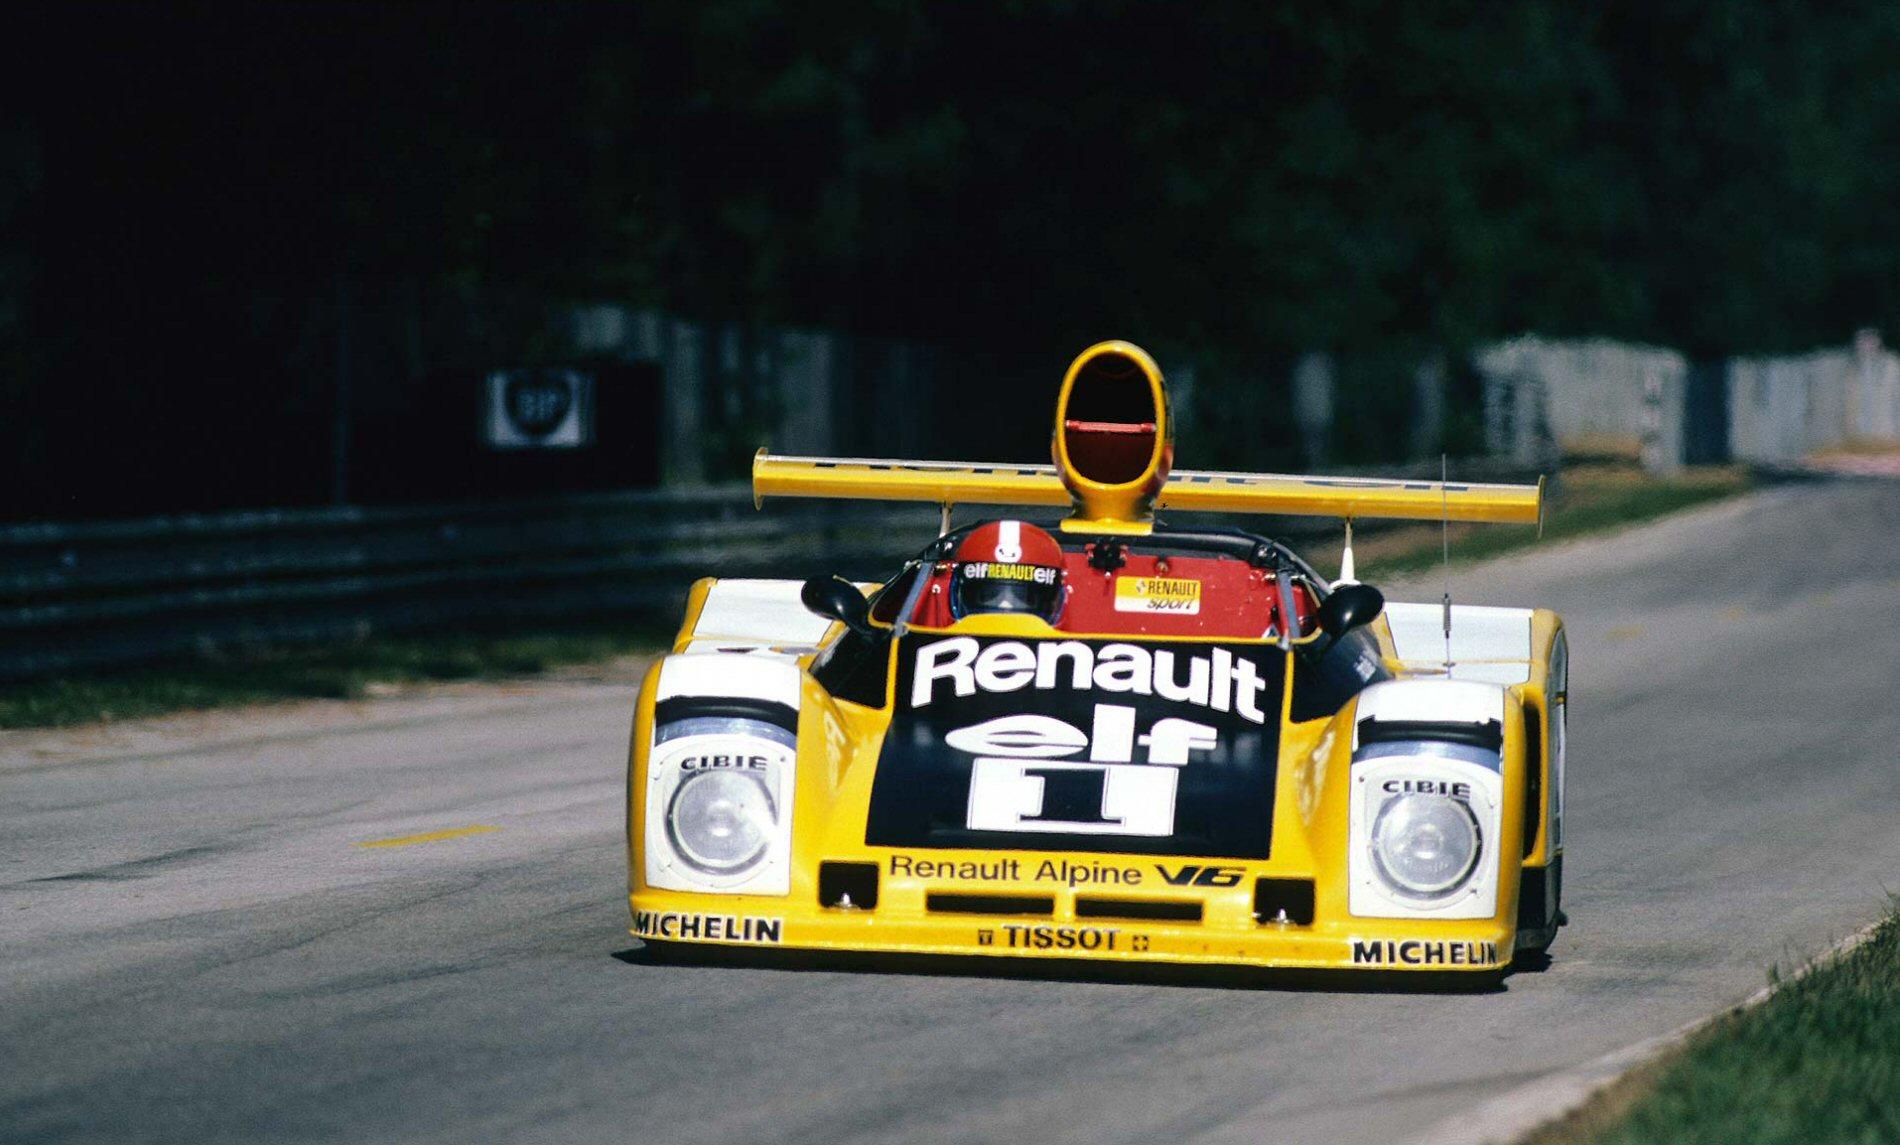 Den suverent raskeste bilen under Le Mans i 1978 var #1, som var den nybygde A443. Den dominerte løpet (her med Jabouille bak rattet), men kom aldri til mål.